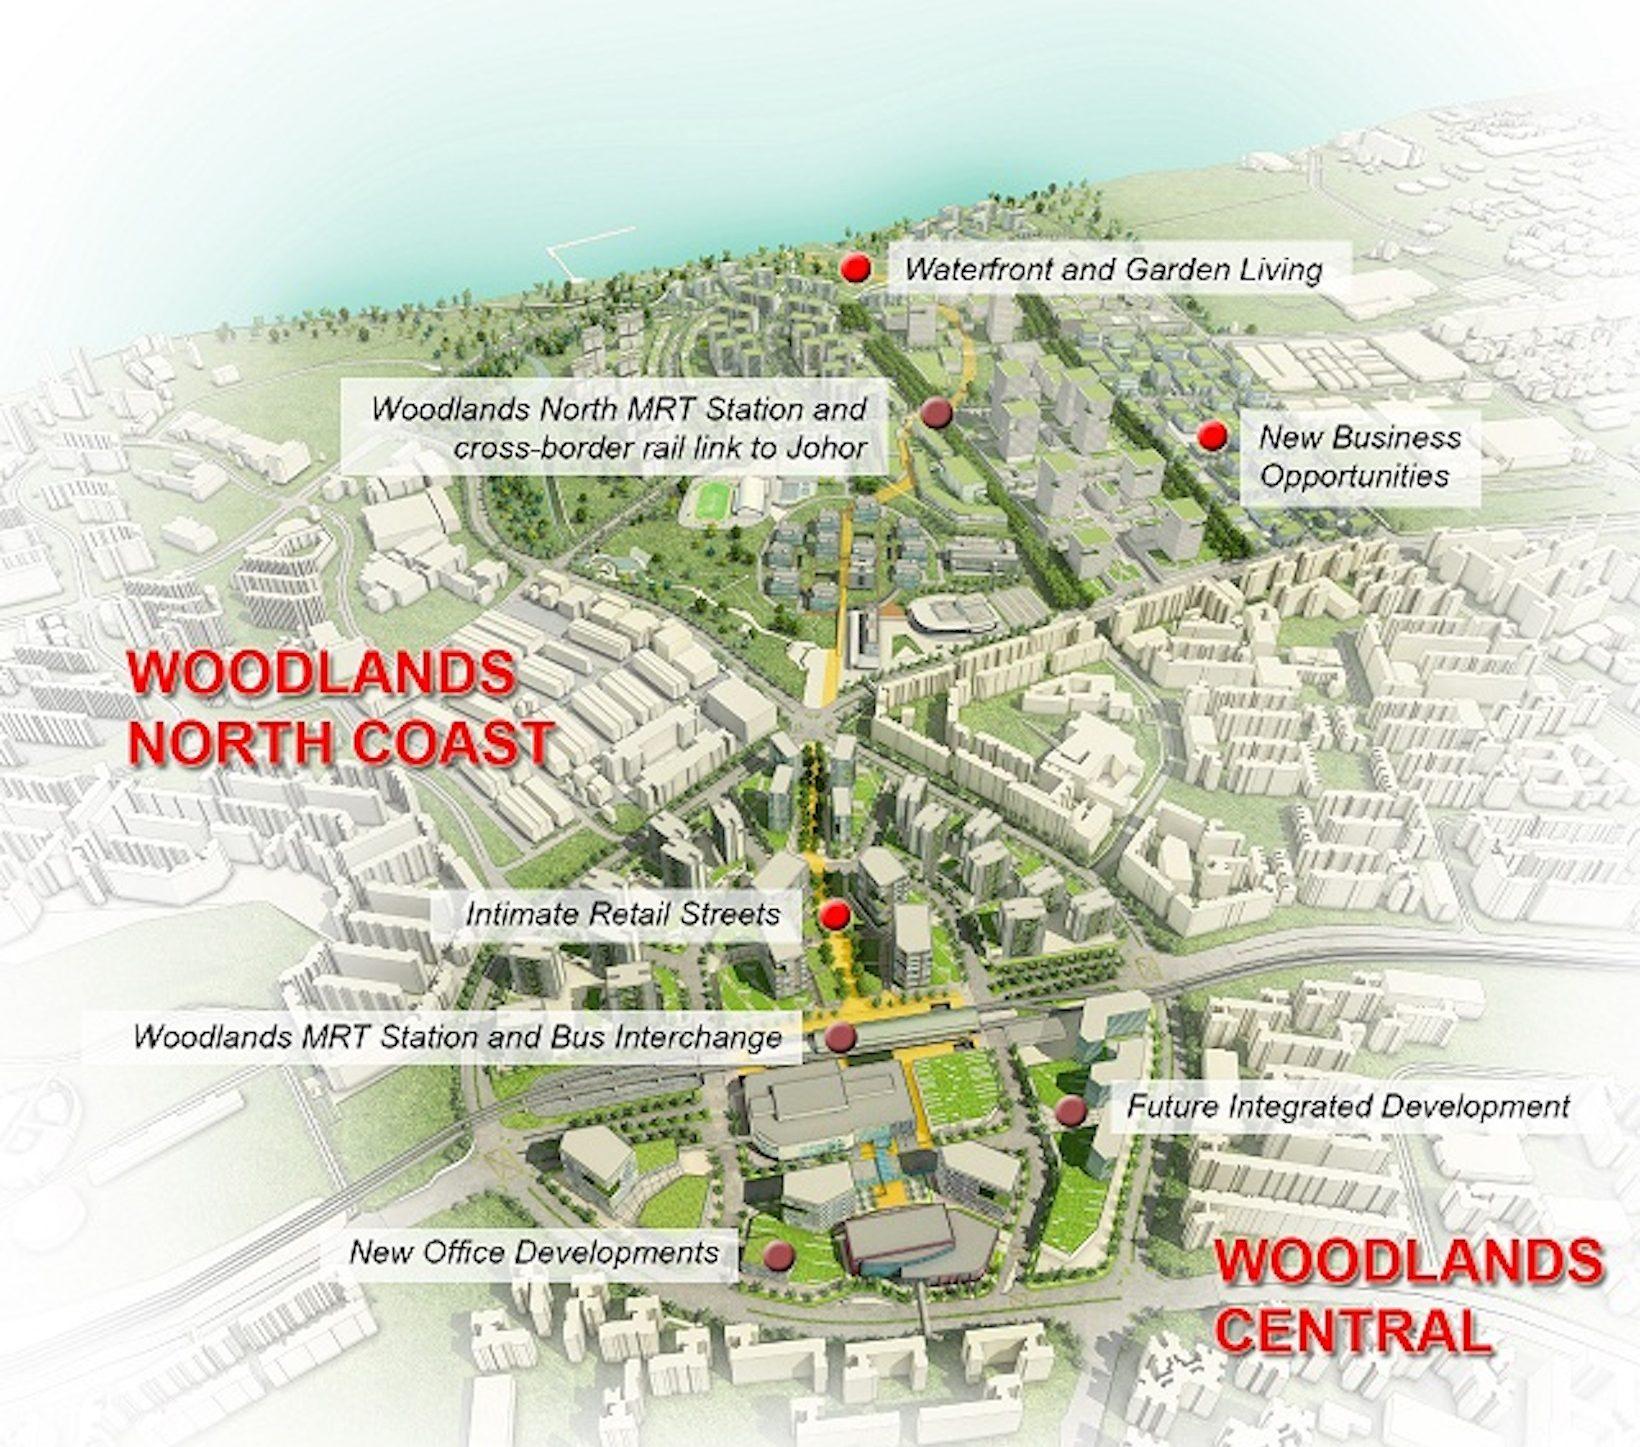 兀兰区域中心 Woodlands Regional Centre URA mater plan